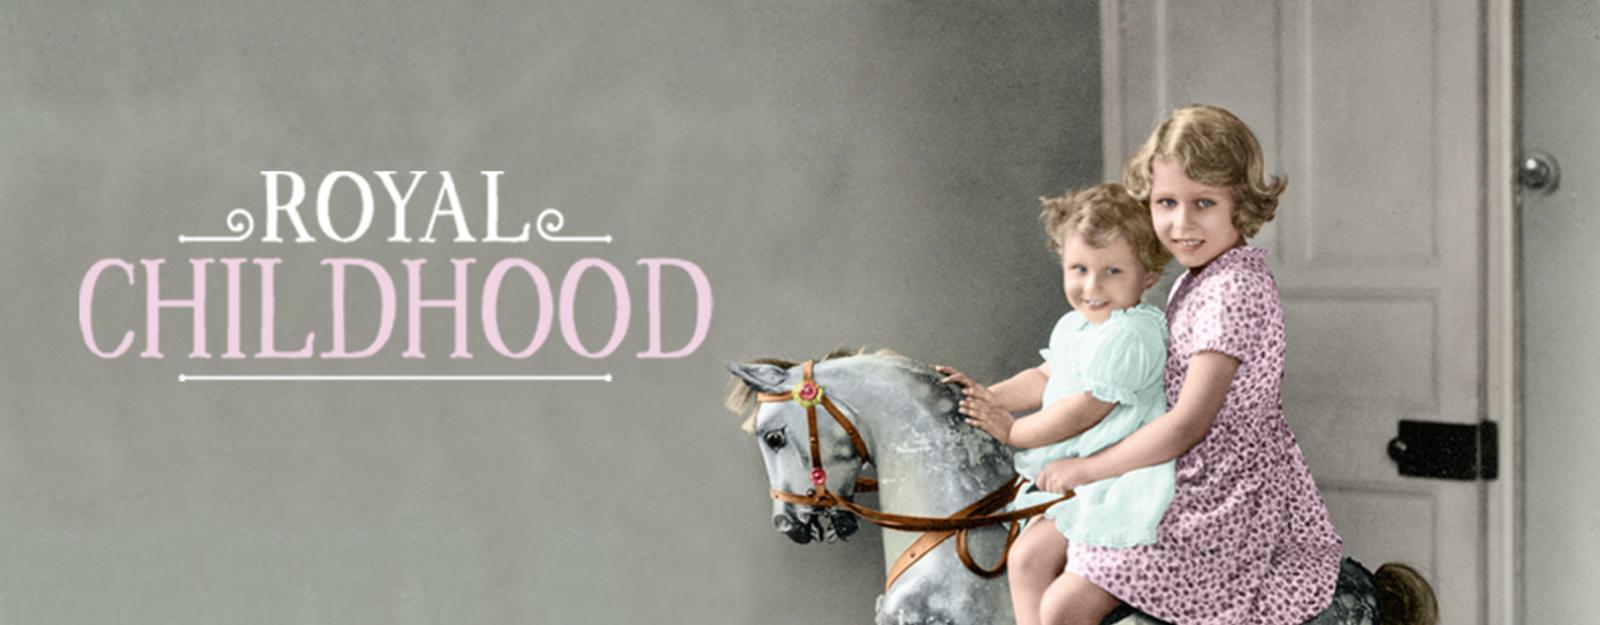 Royal Childhood exhibition depicting Princess Elizabeth and Princess Margeret on a wooden rocking horse